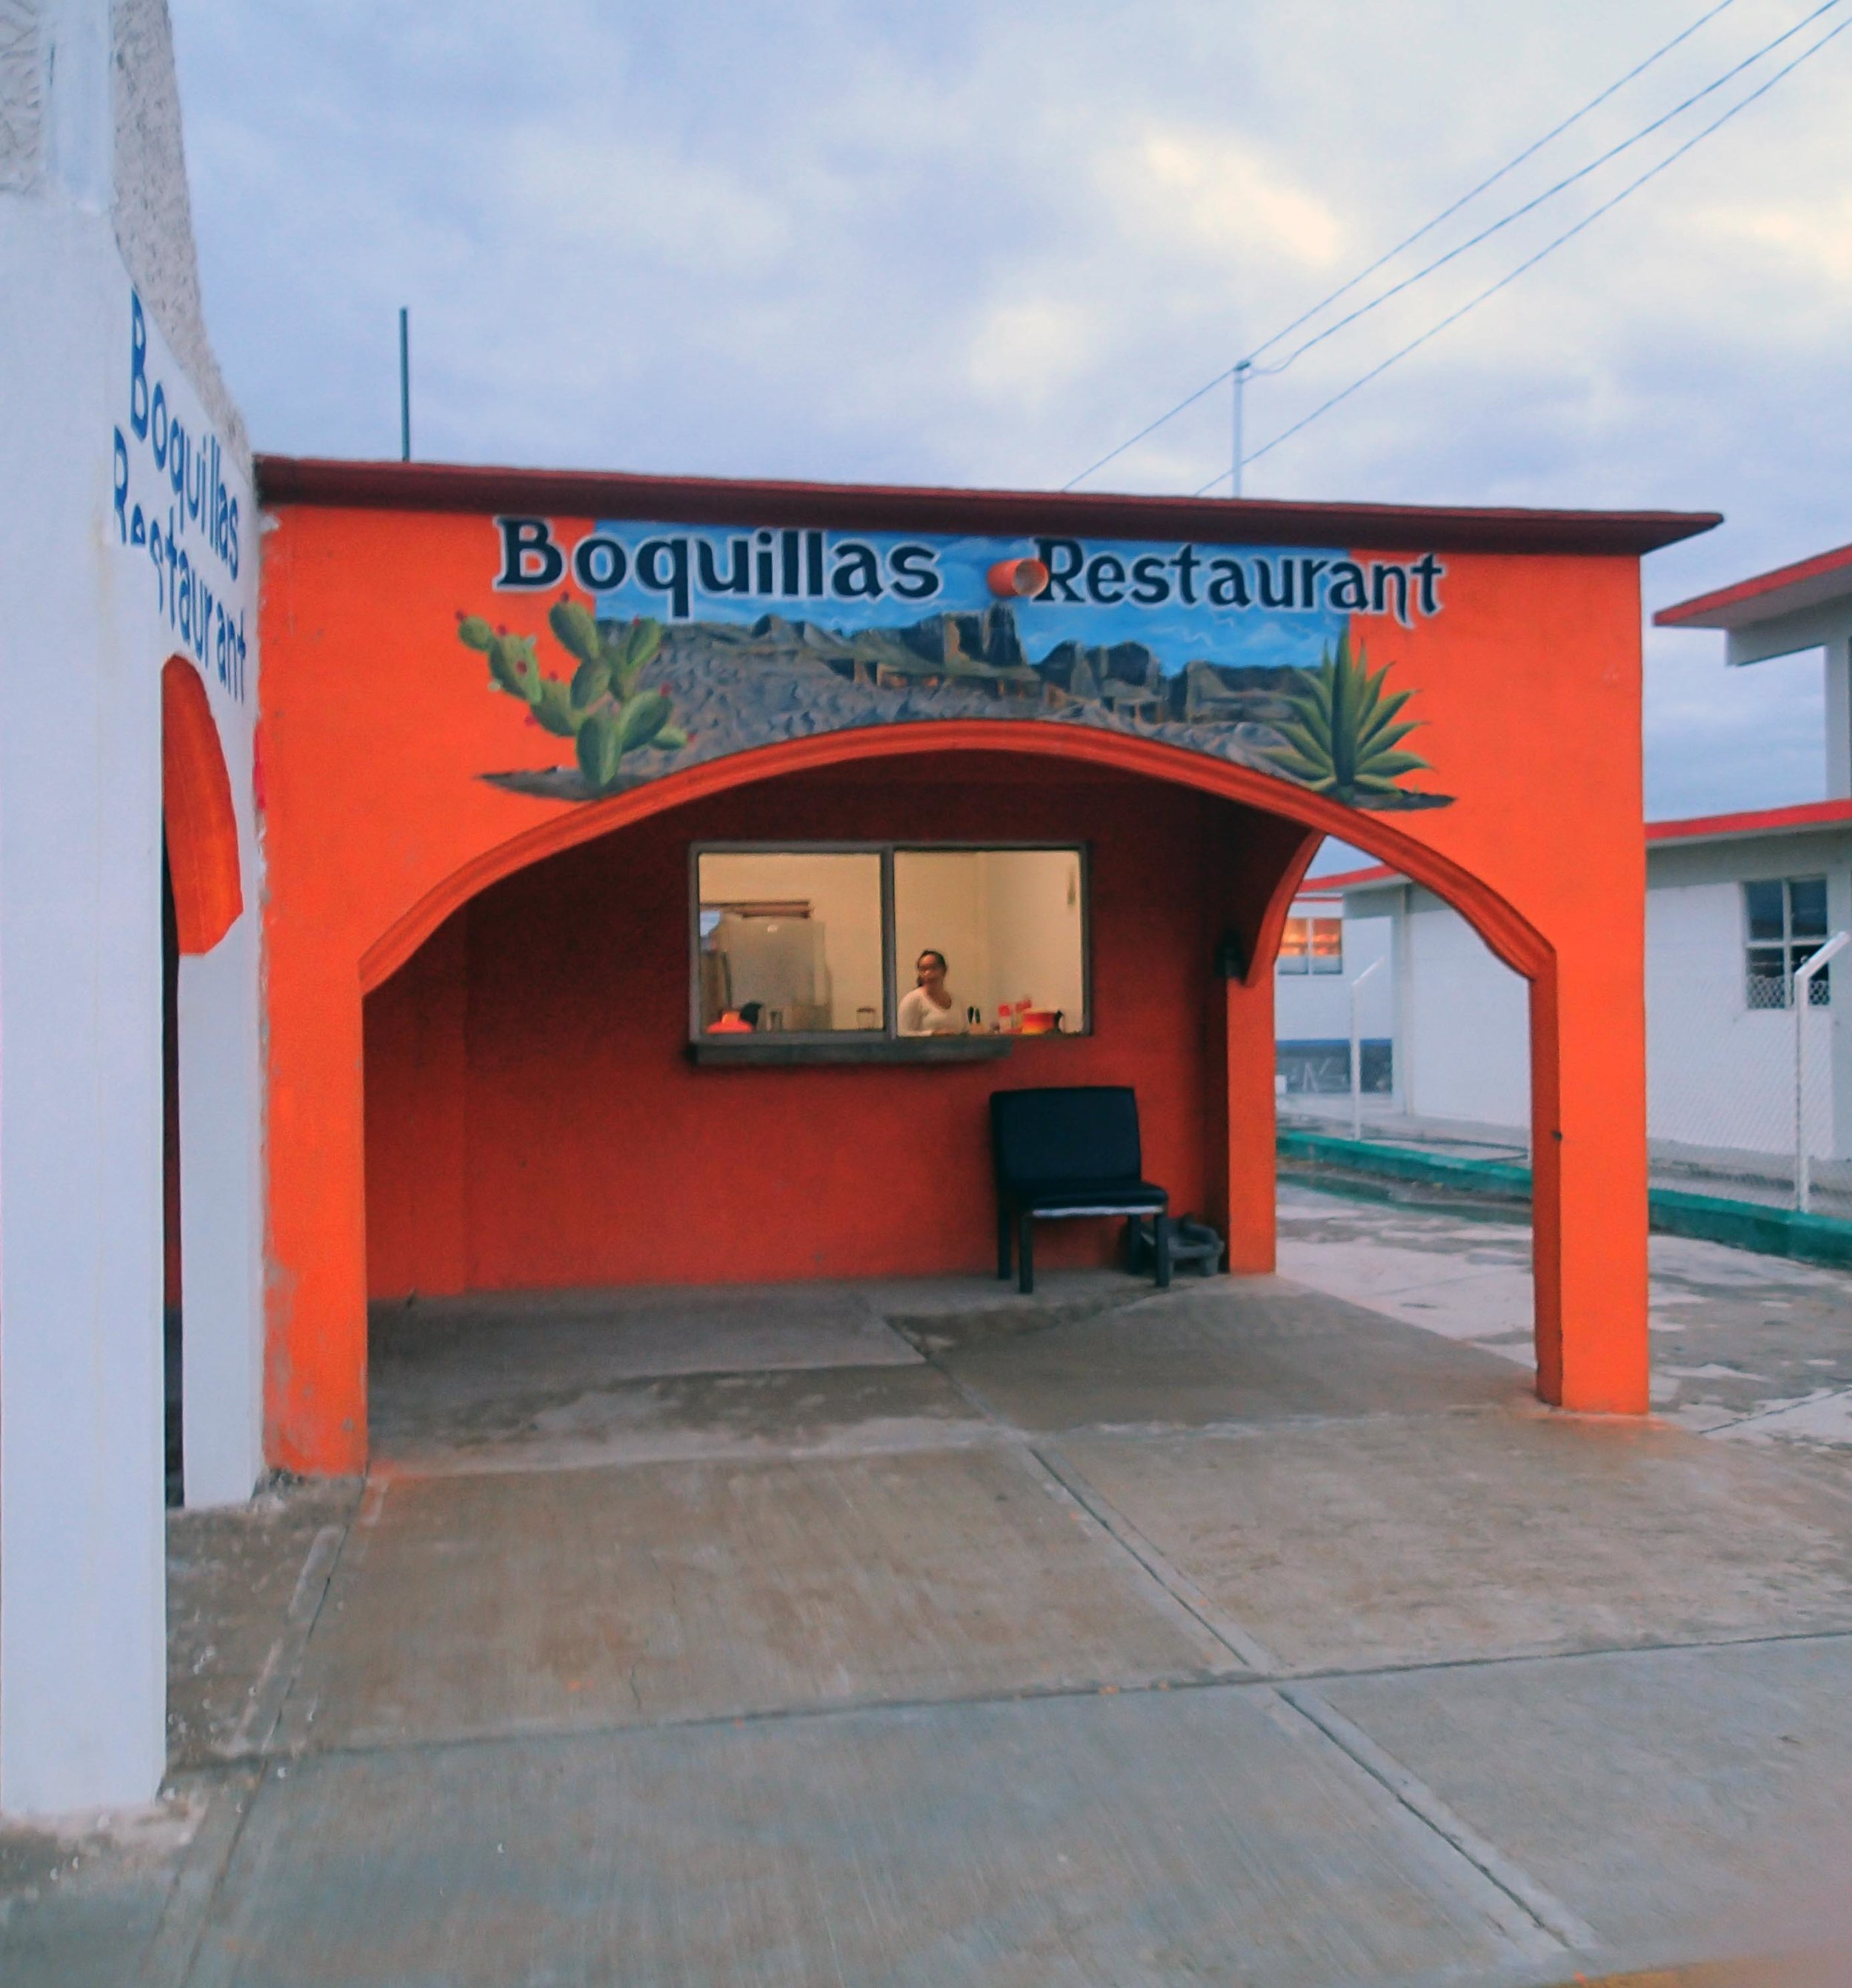 Boquillas Restaurant.jpg